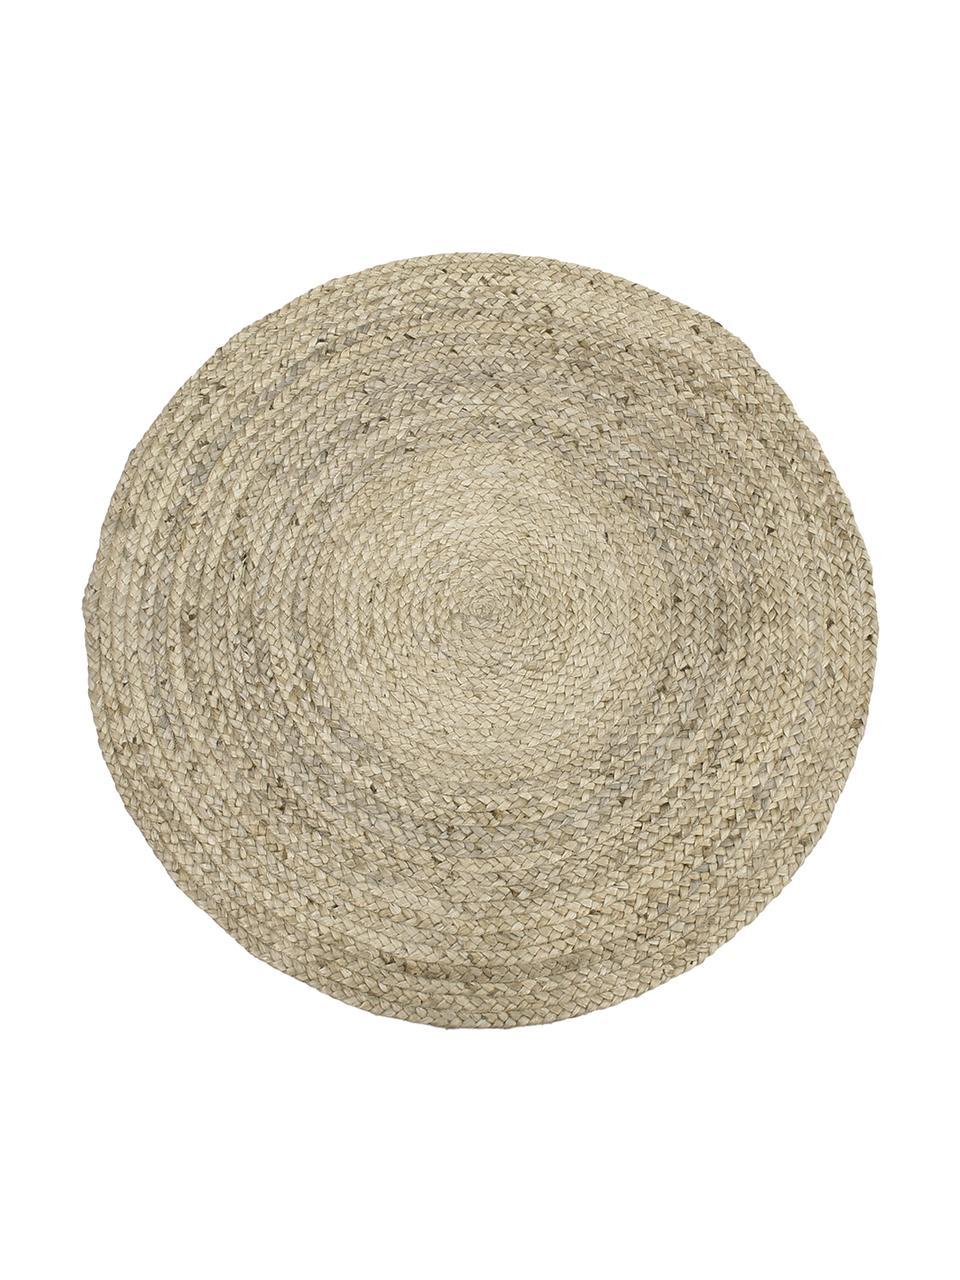 Tappeto rotondo in juta tessuto a mano Sharmila, 100% juta, Beige, Ø 140 cm (taglia M)